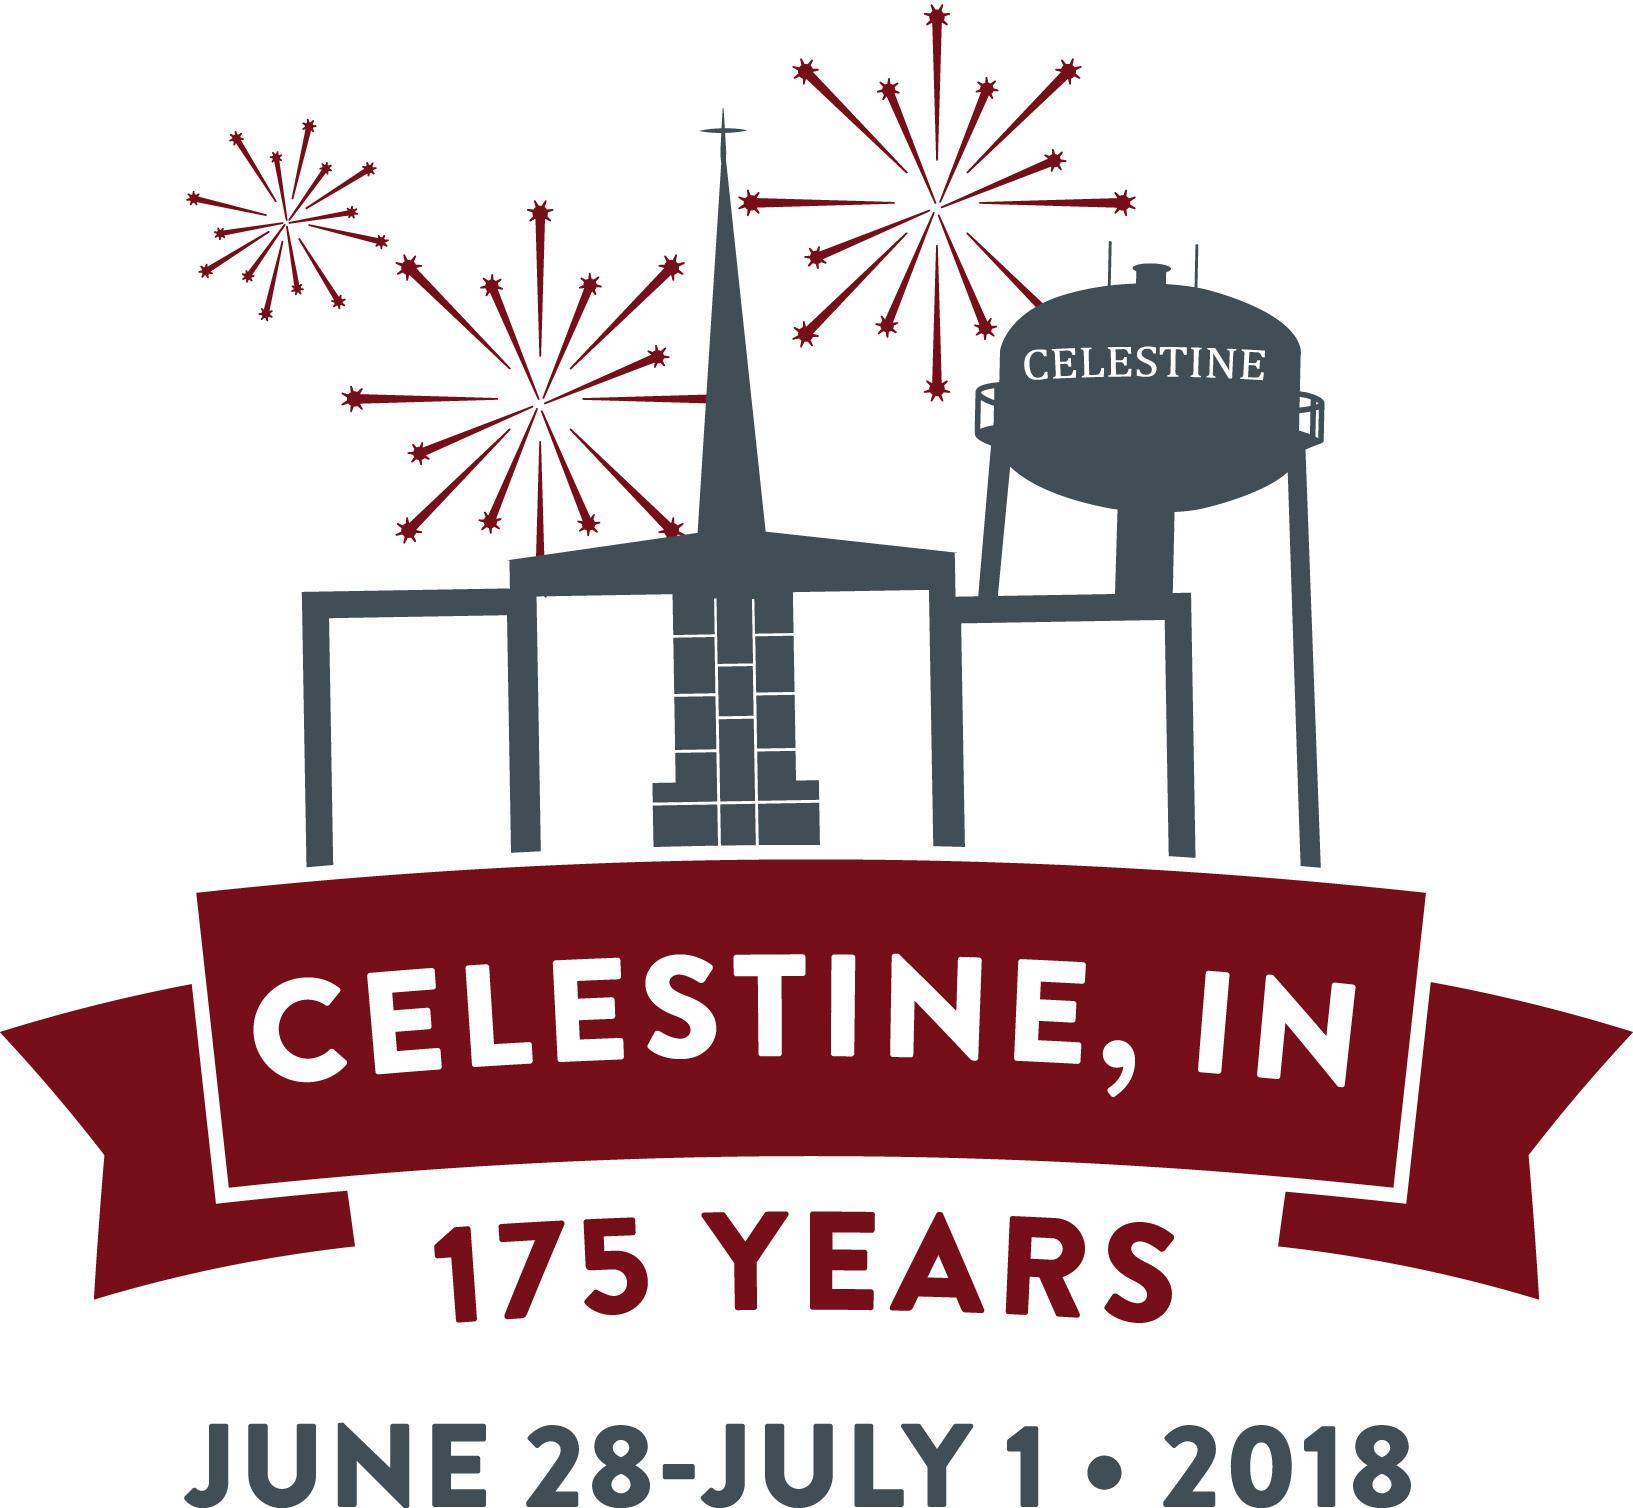 Celestine Celebrates 175 Years Beginning Thursday Evening